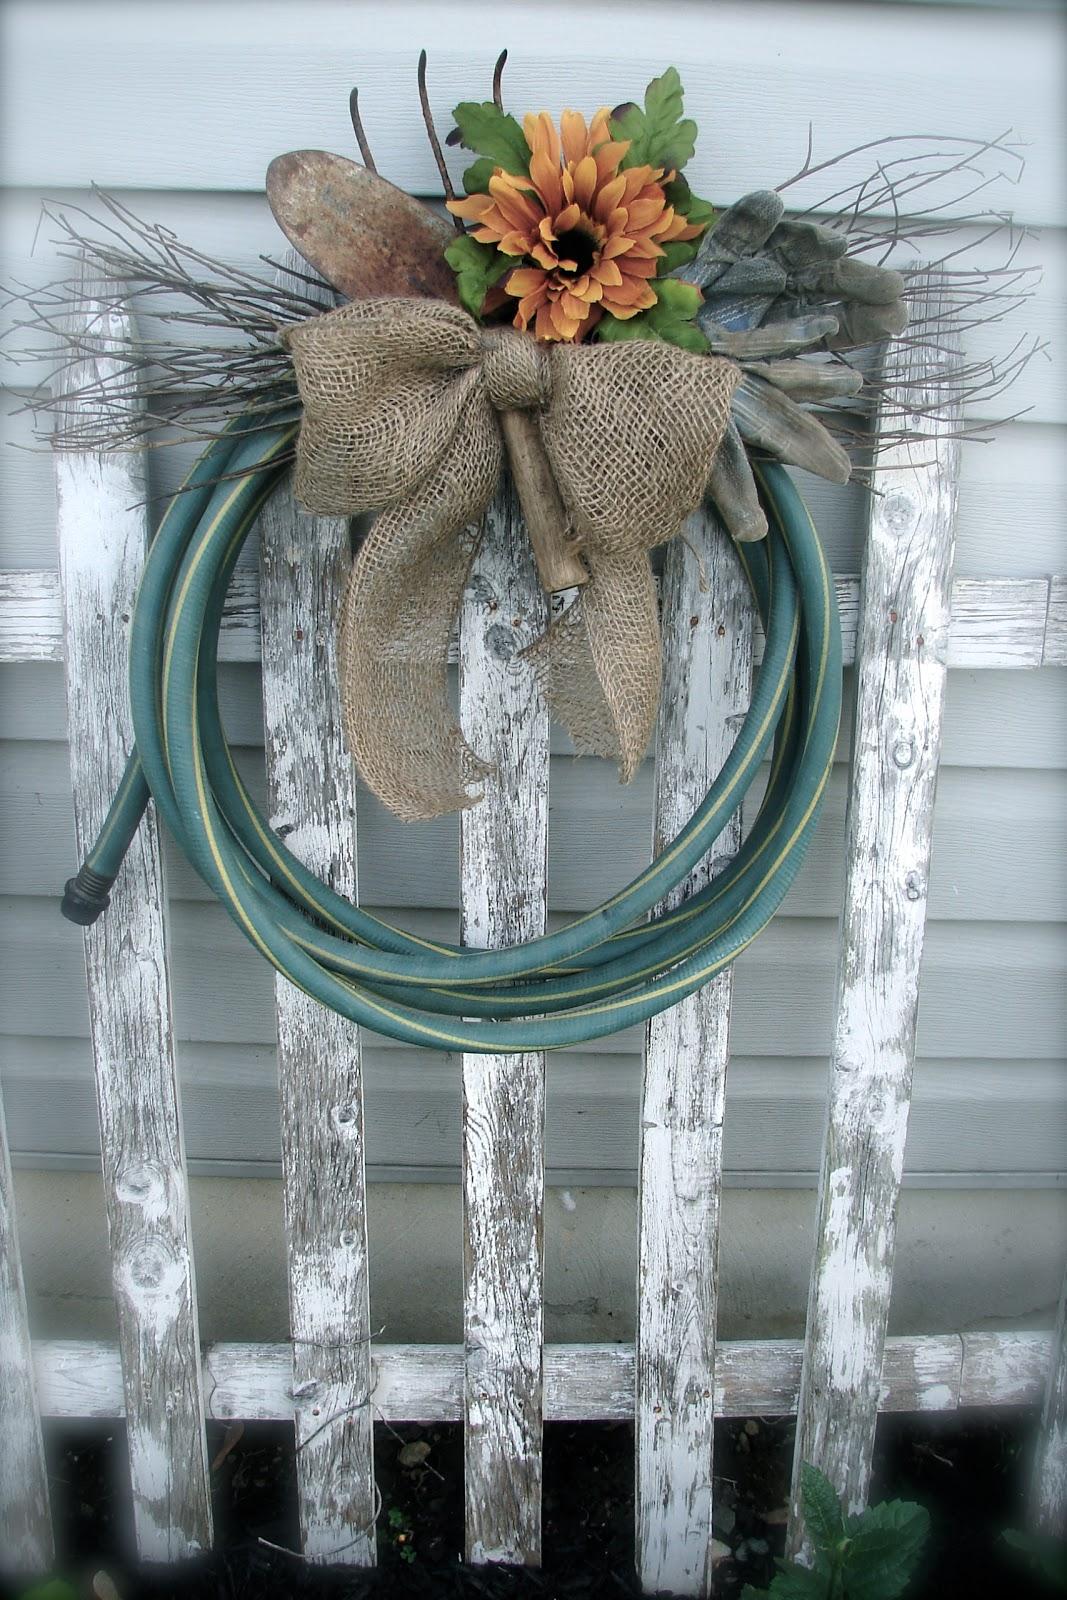 Water Hose Wreath Garden Hose Wreath